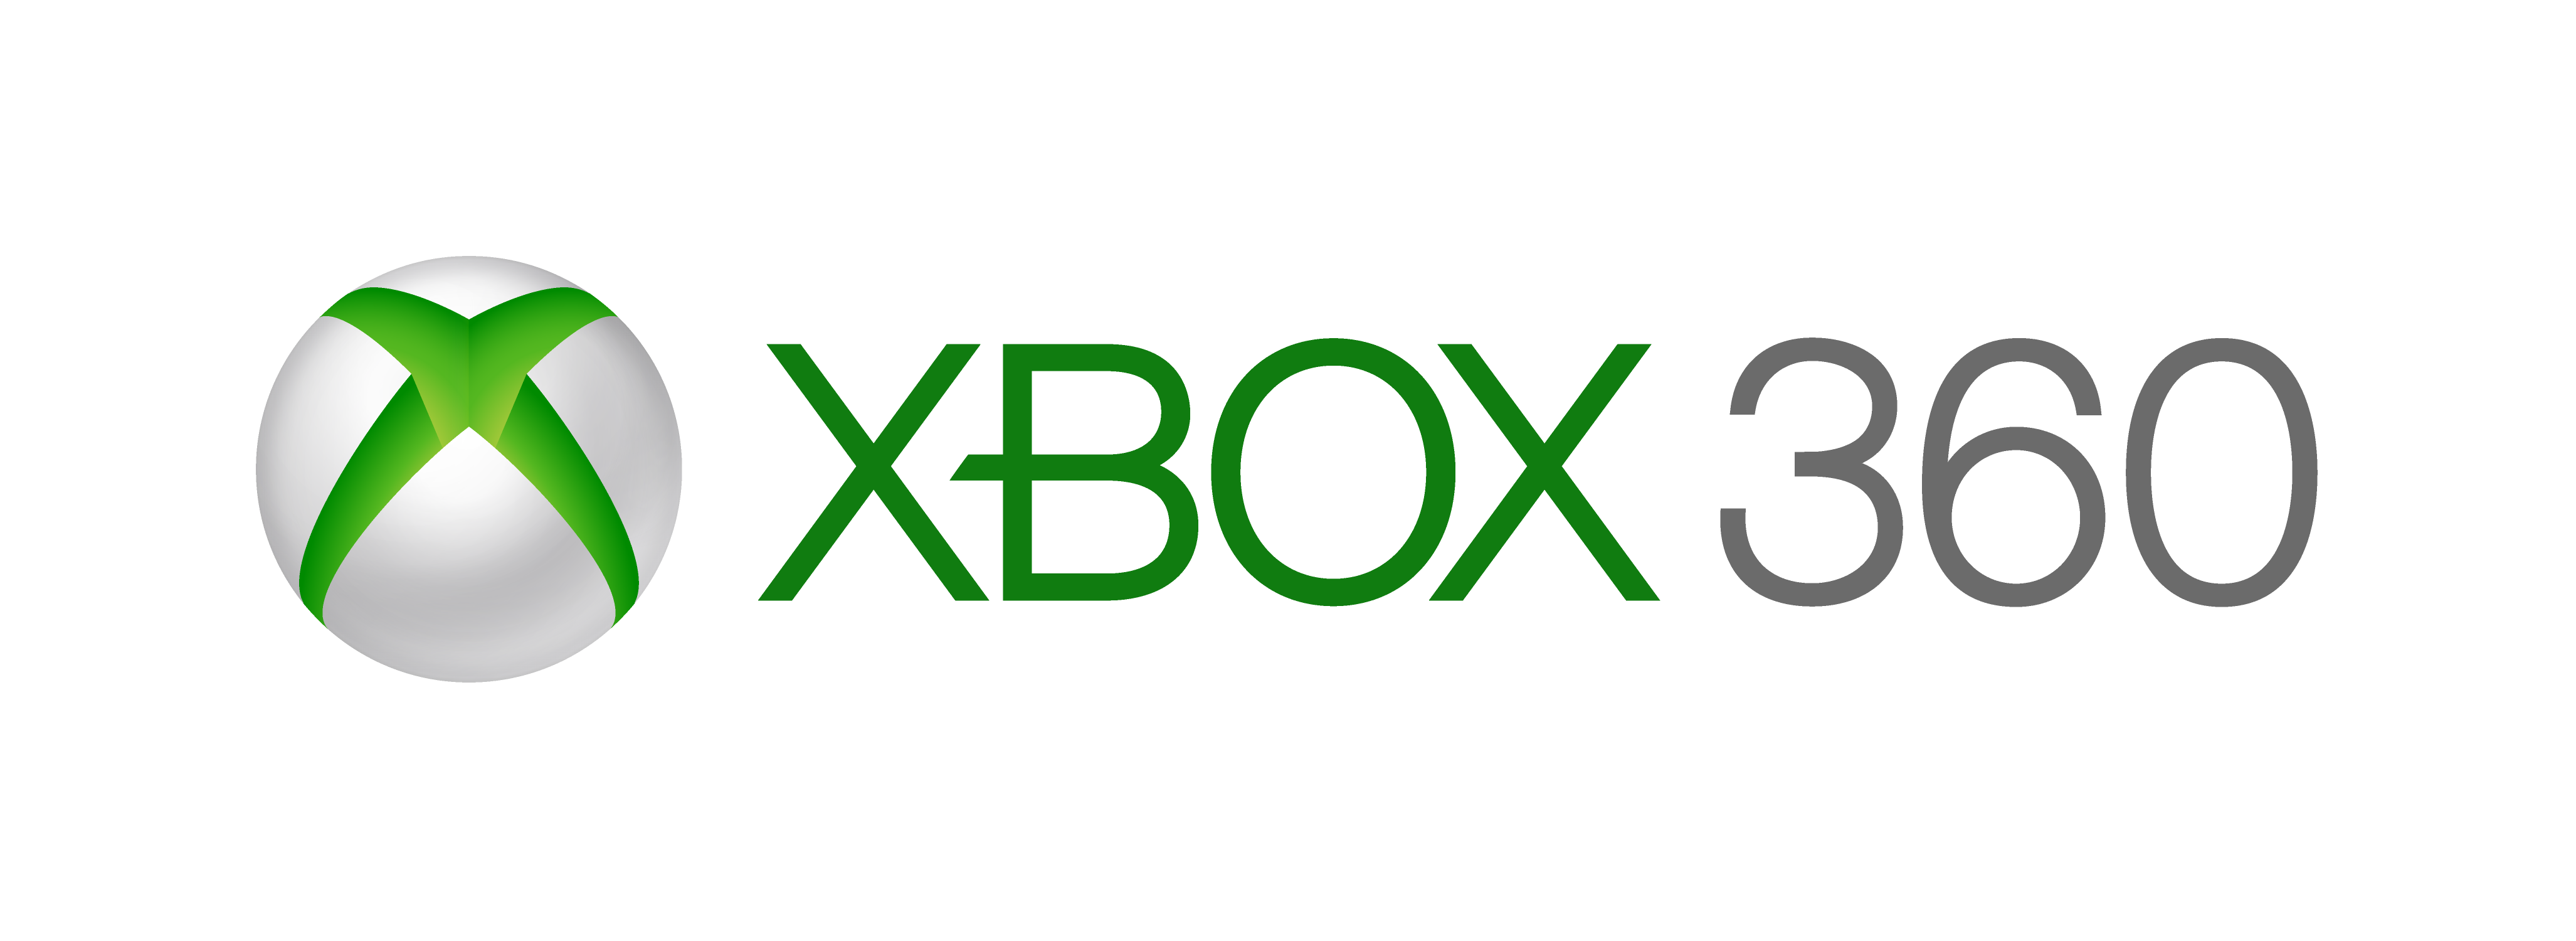 xbox logo png transparent #2491